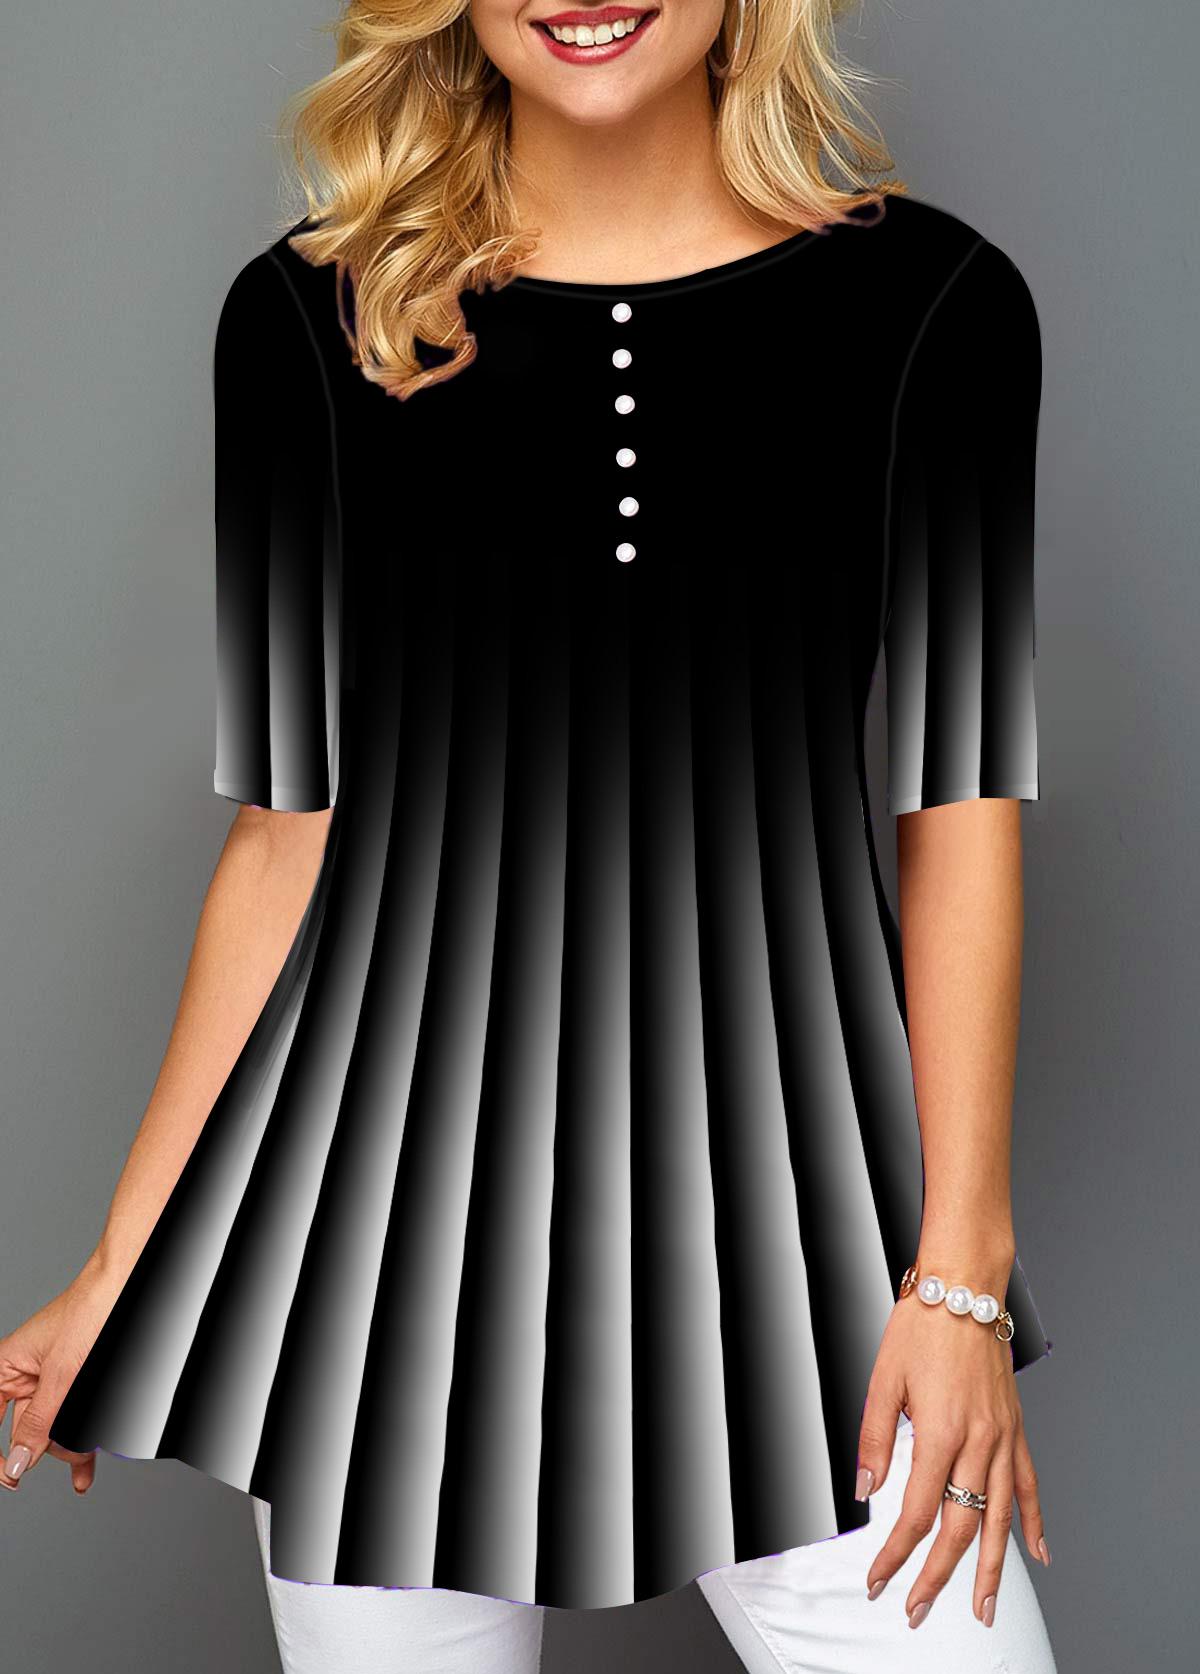 Gradient Stripe Print Button Detail T Shirt